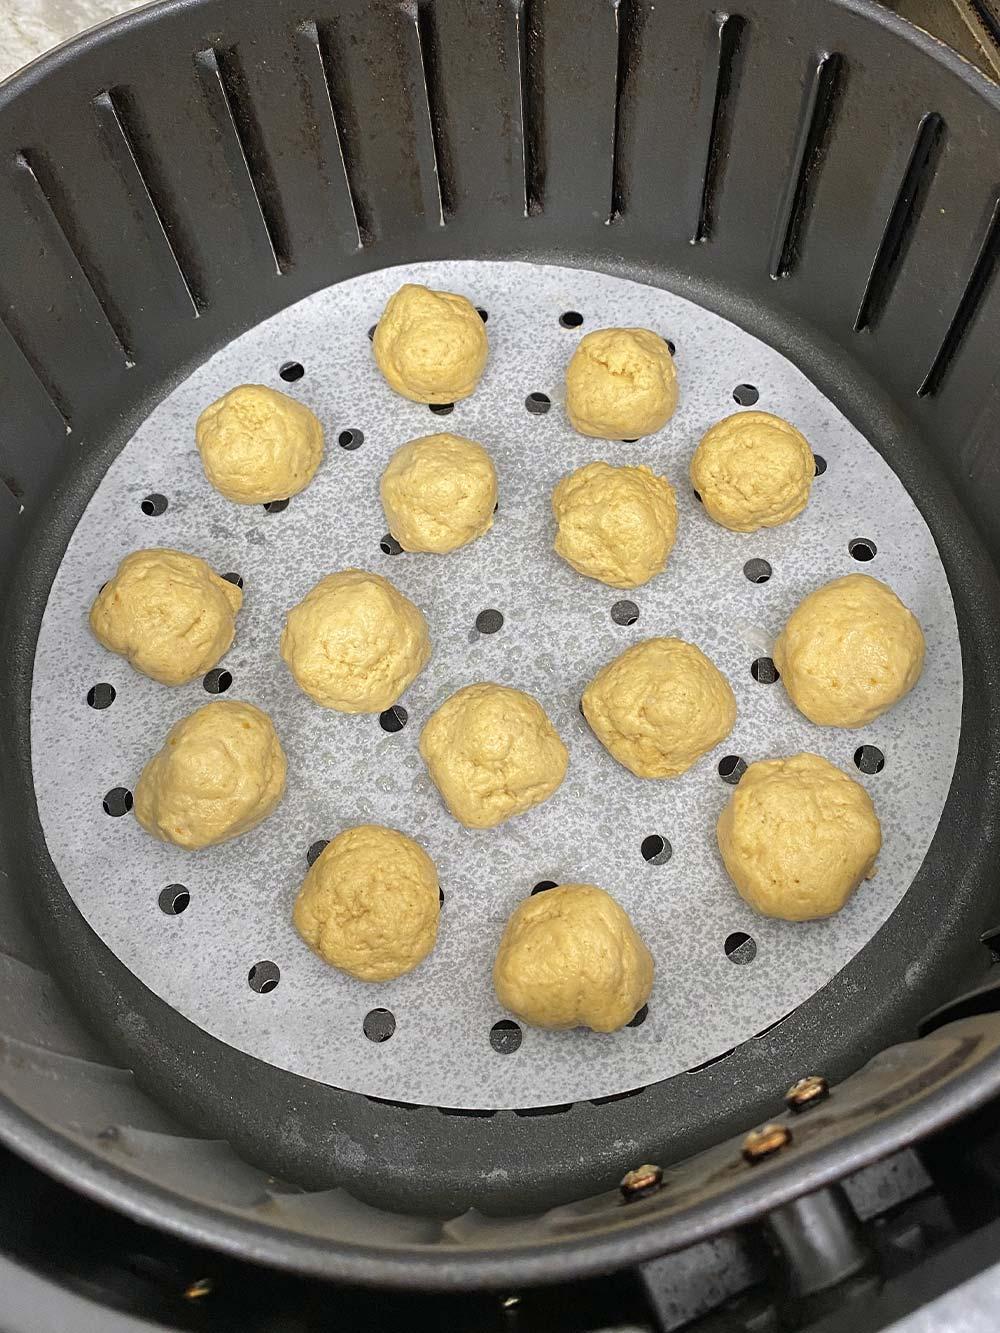 Pumpkin donut holes before baking